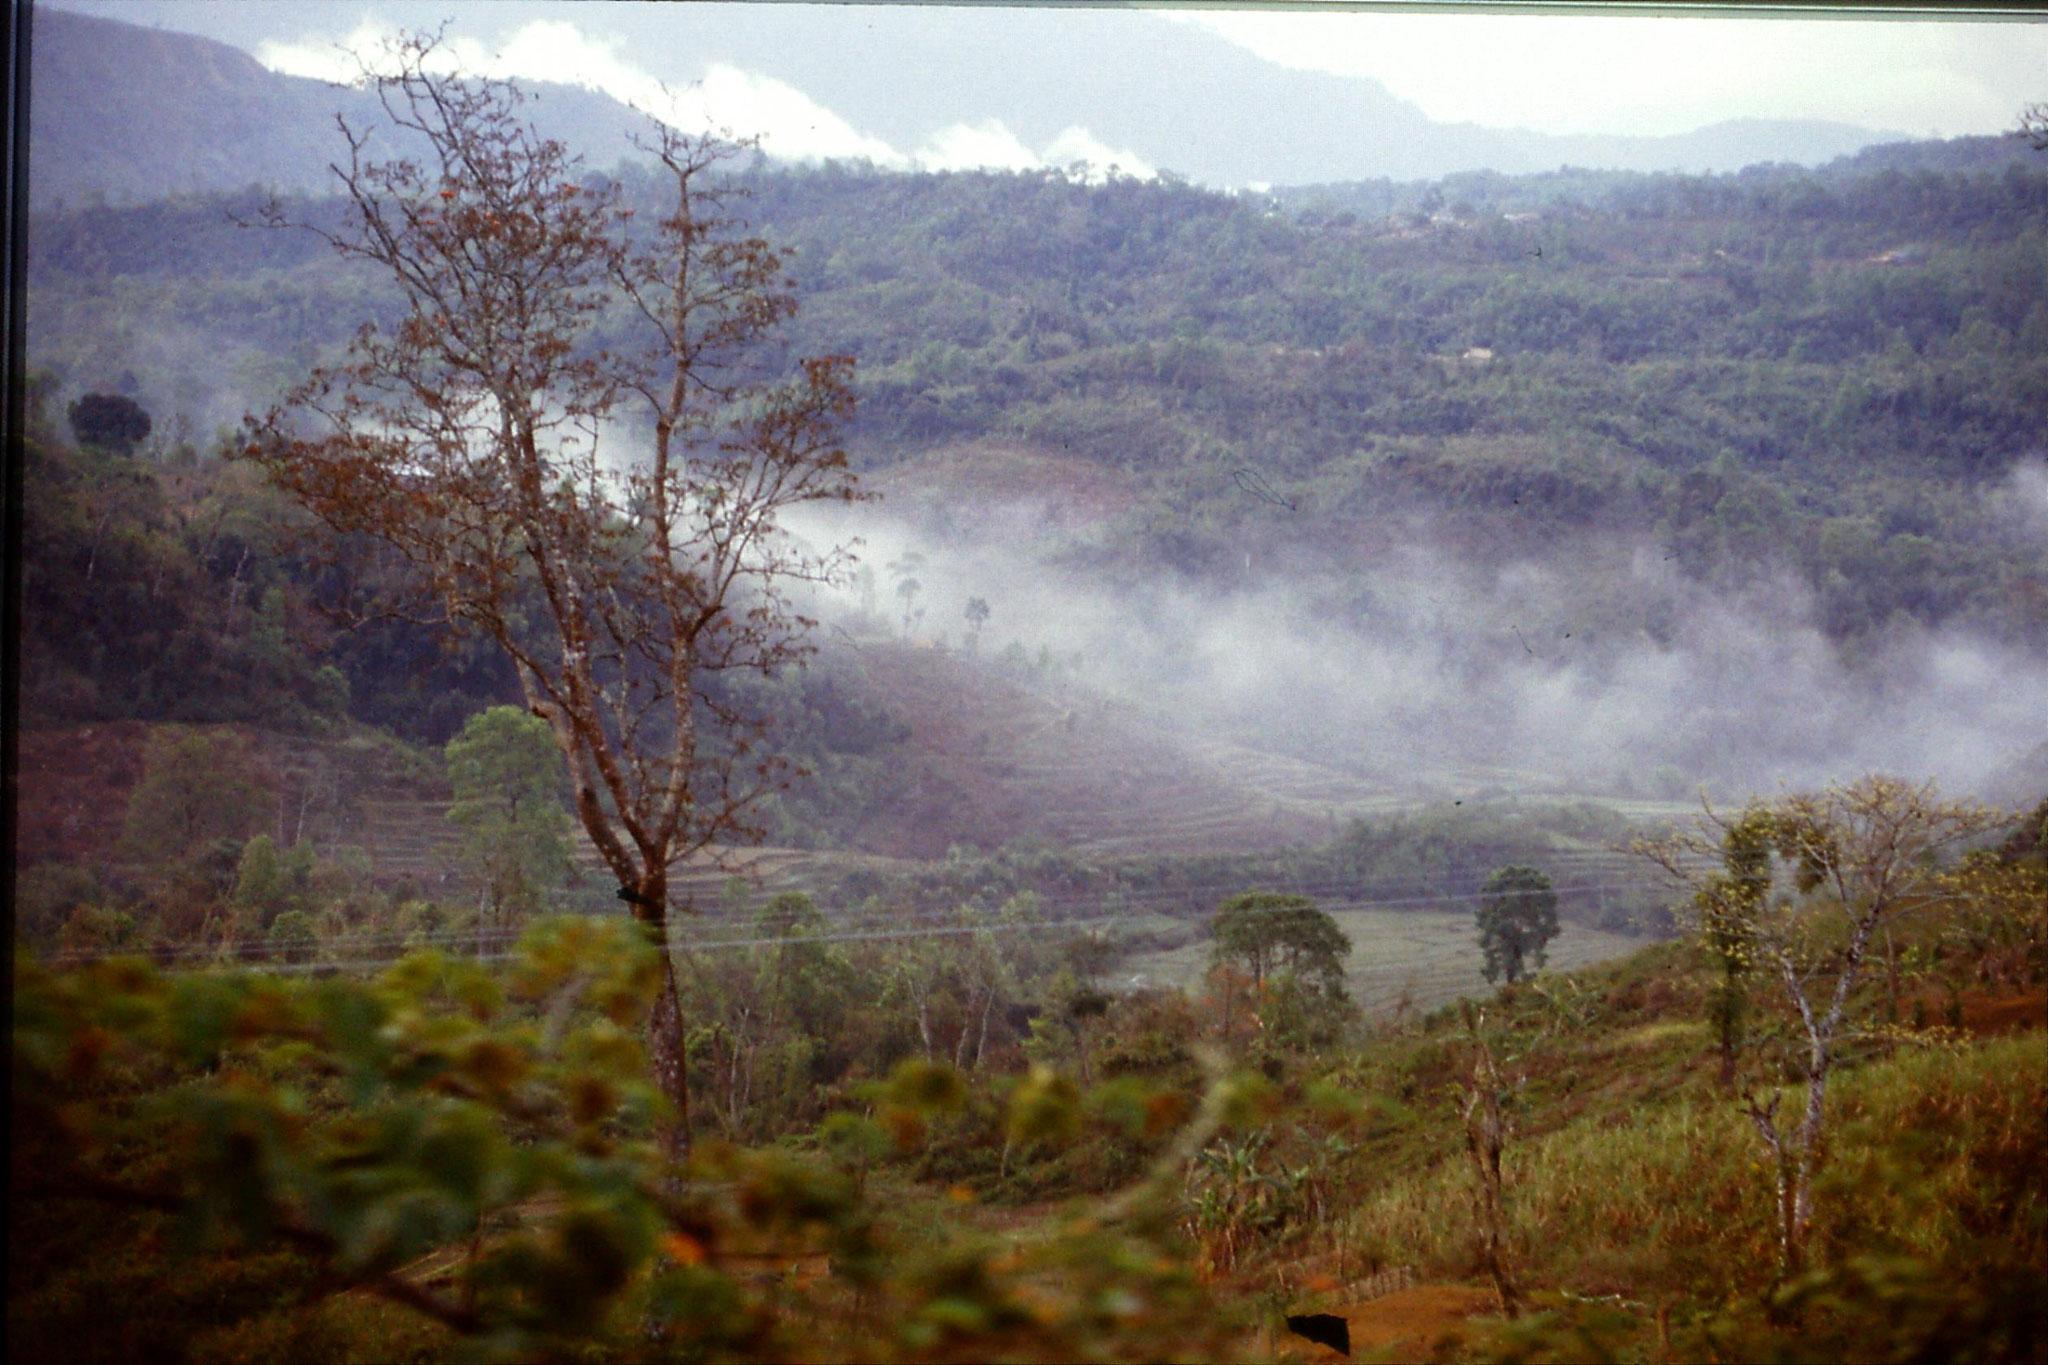 109/29: 12/4 In Cachar Hills - Hills near Haflong